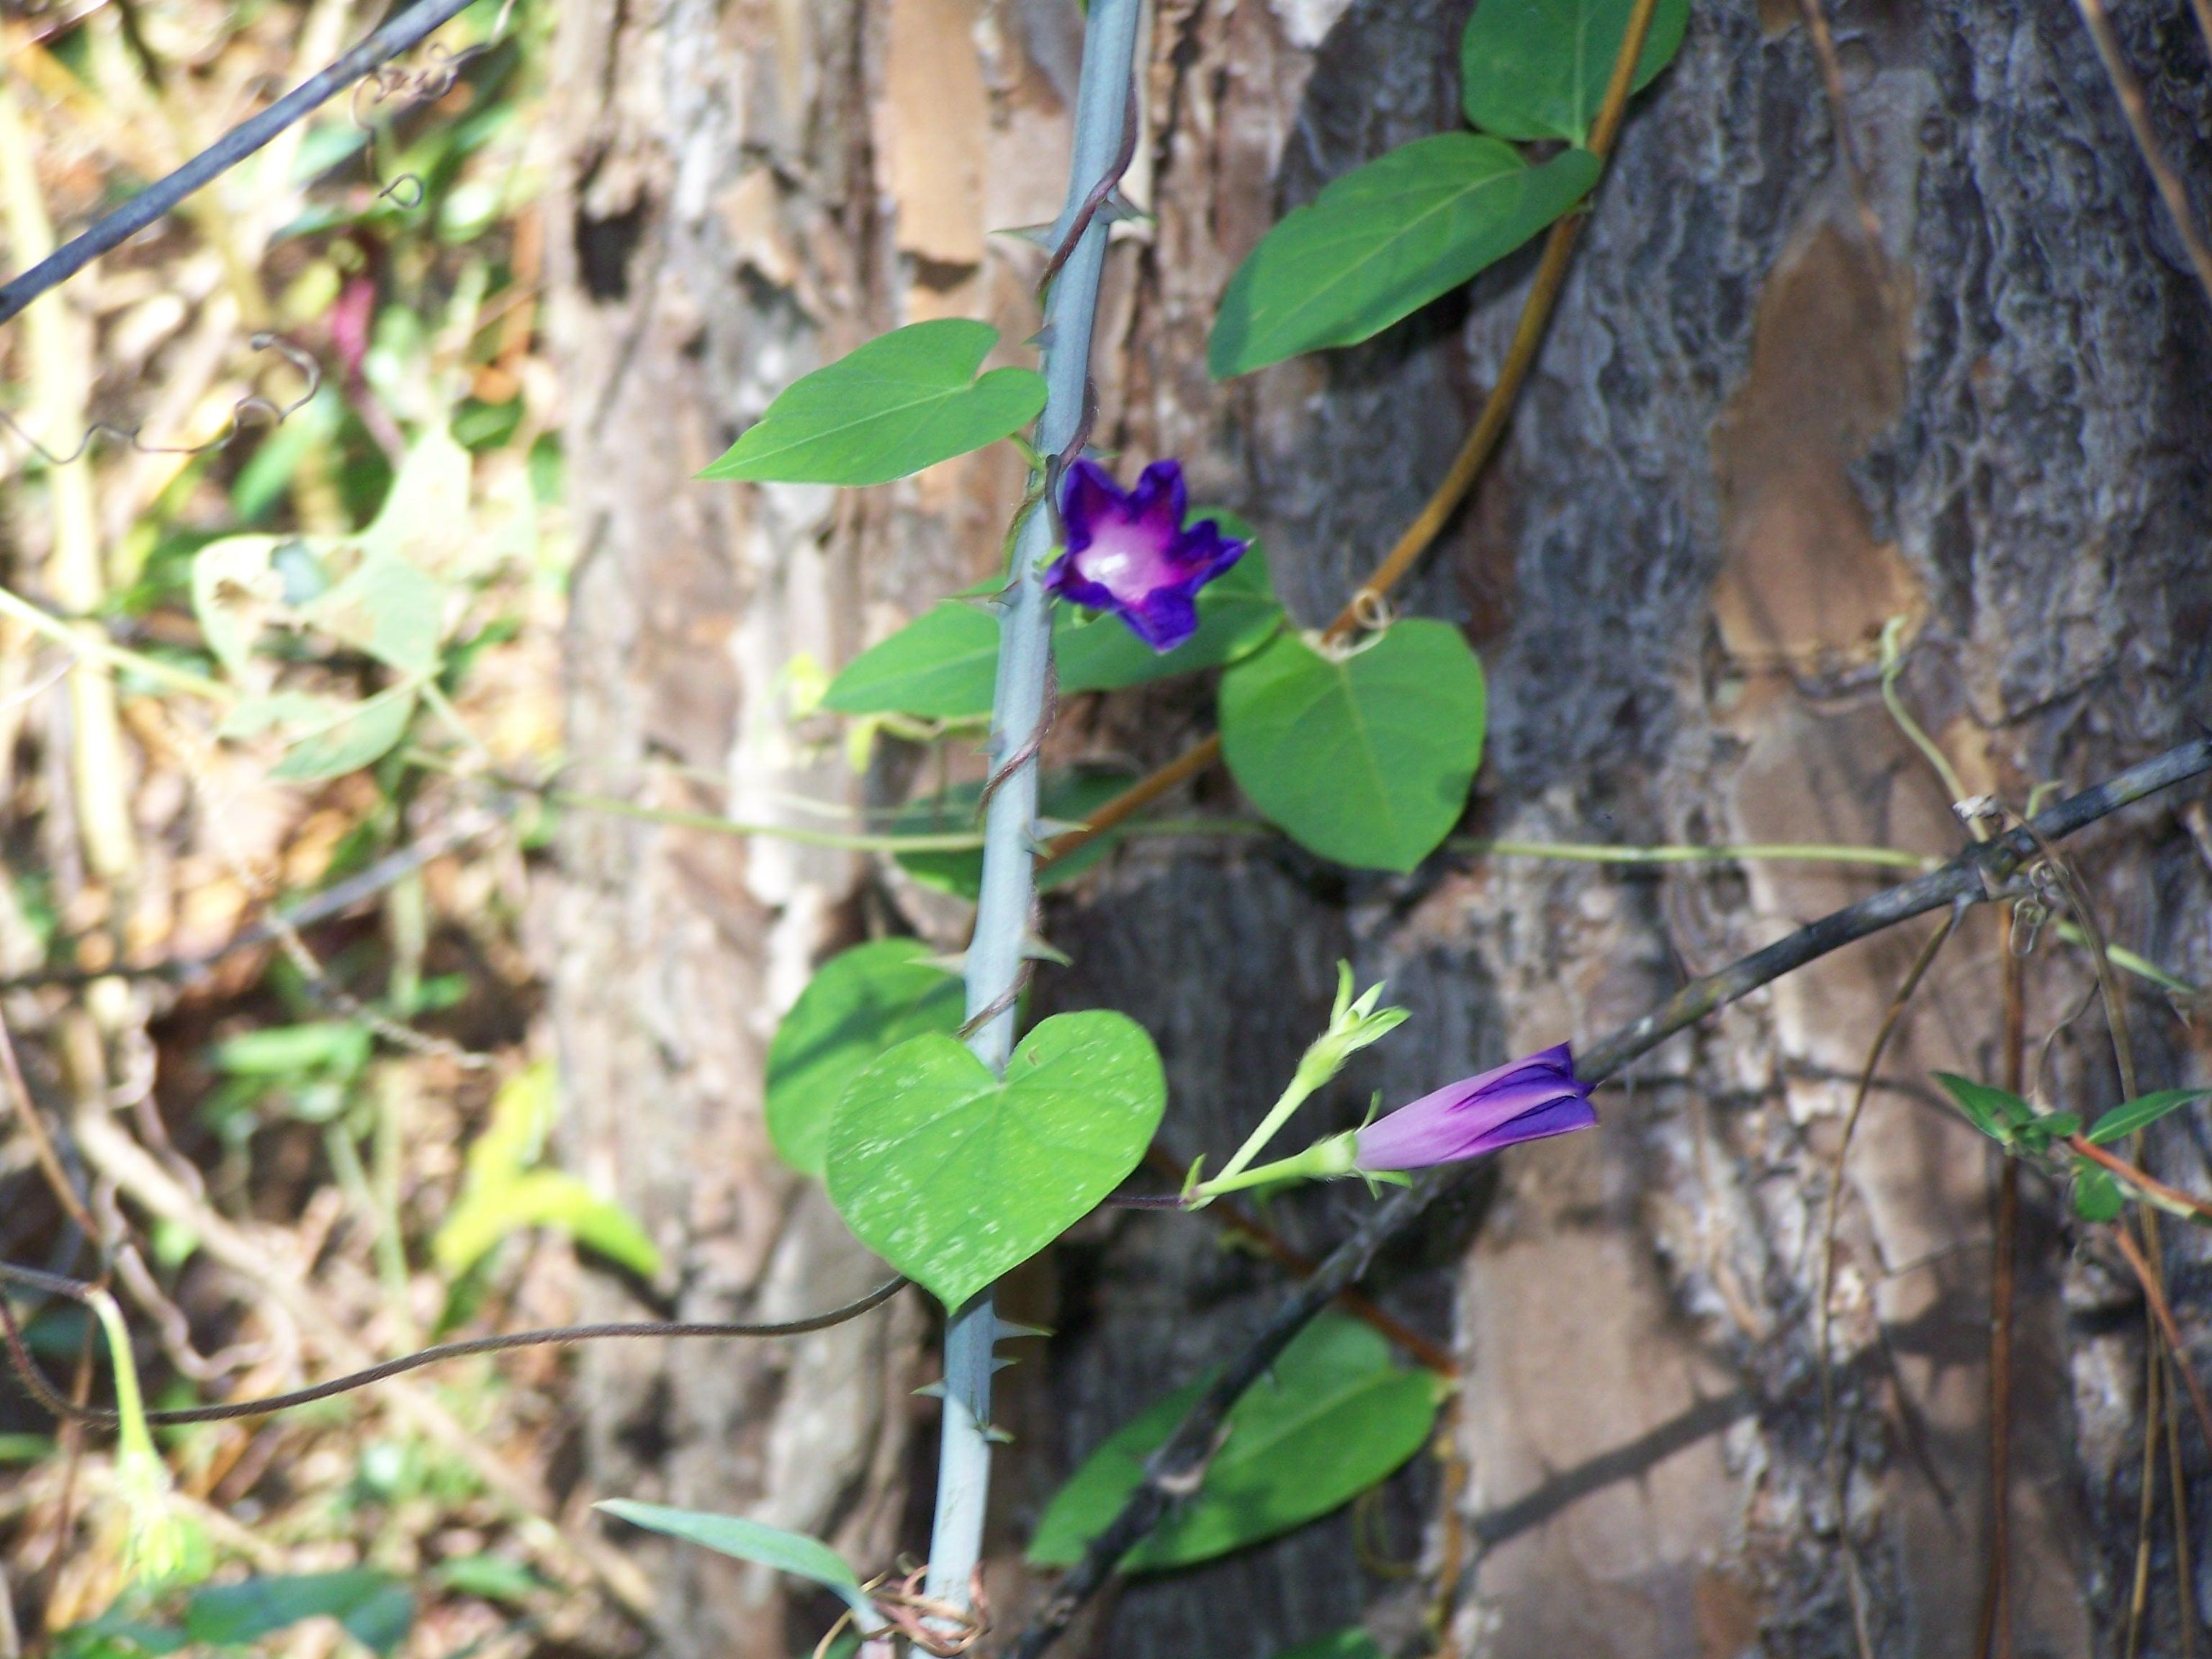 Vine with purple flower a morning glory morning glory vine mightylinksfo